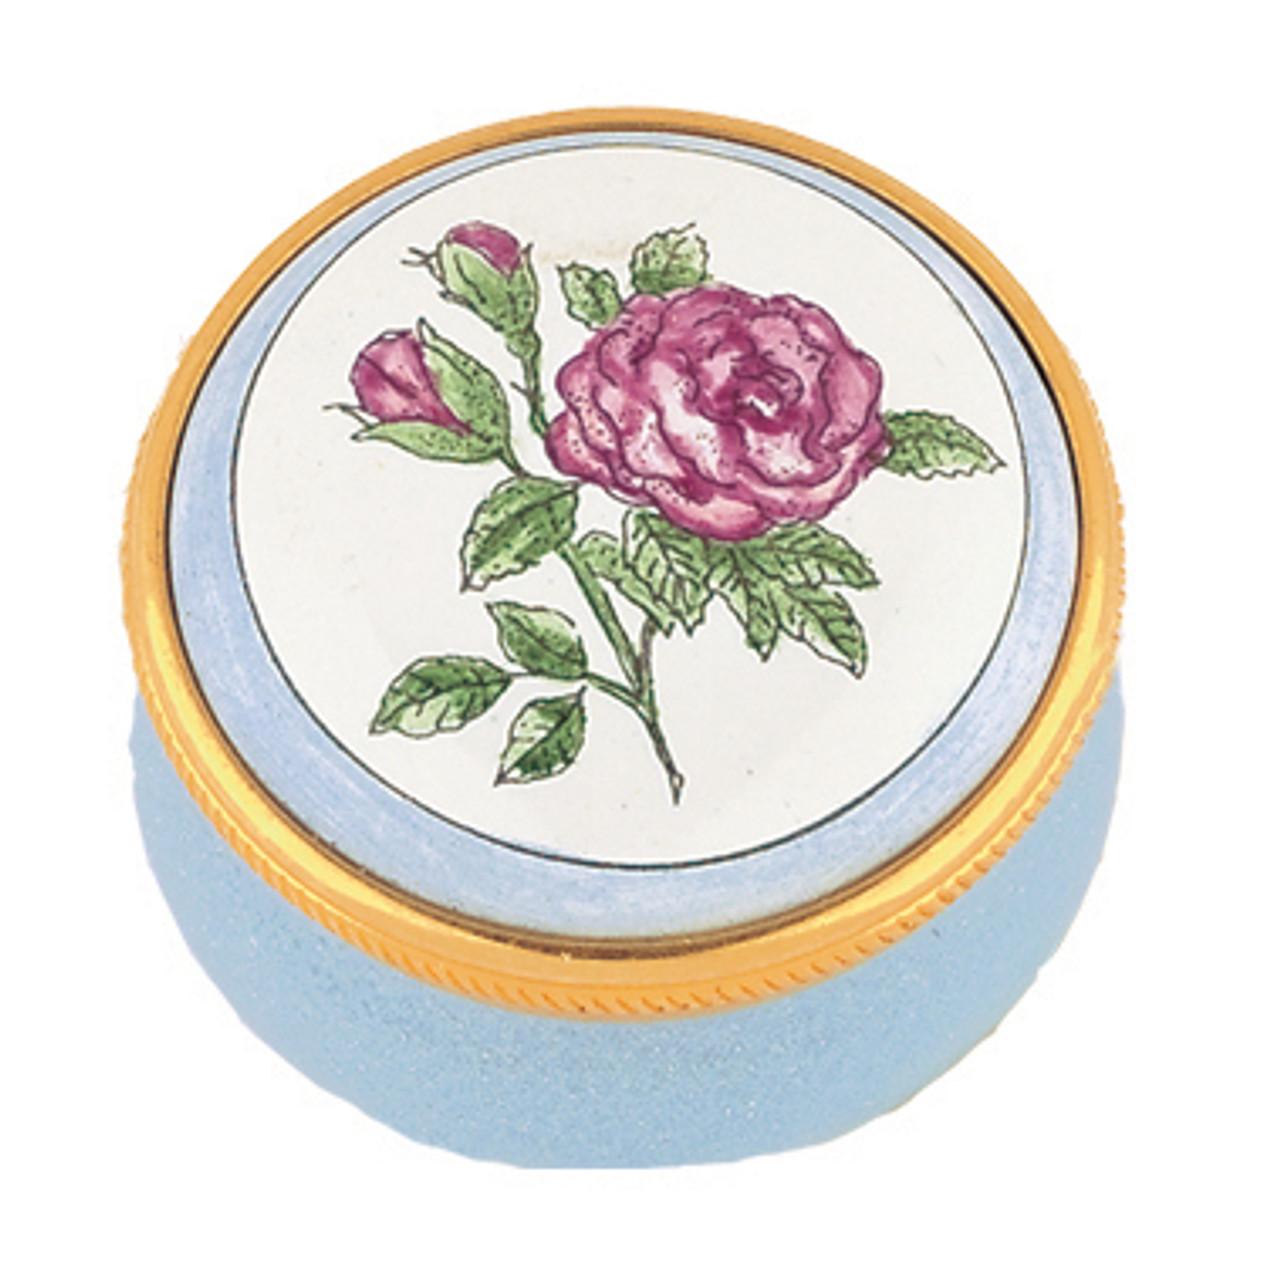 Staffordshire English Rose (01-017)